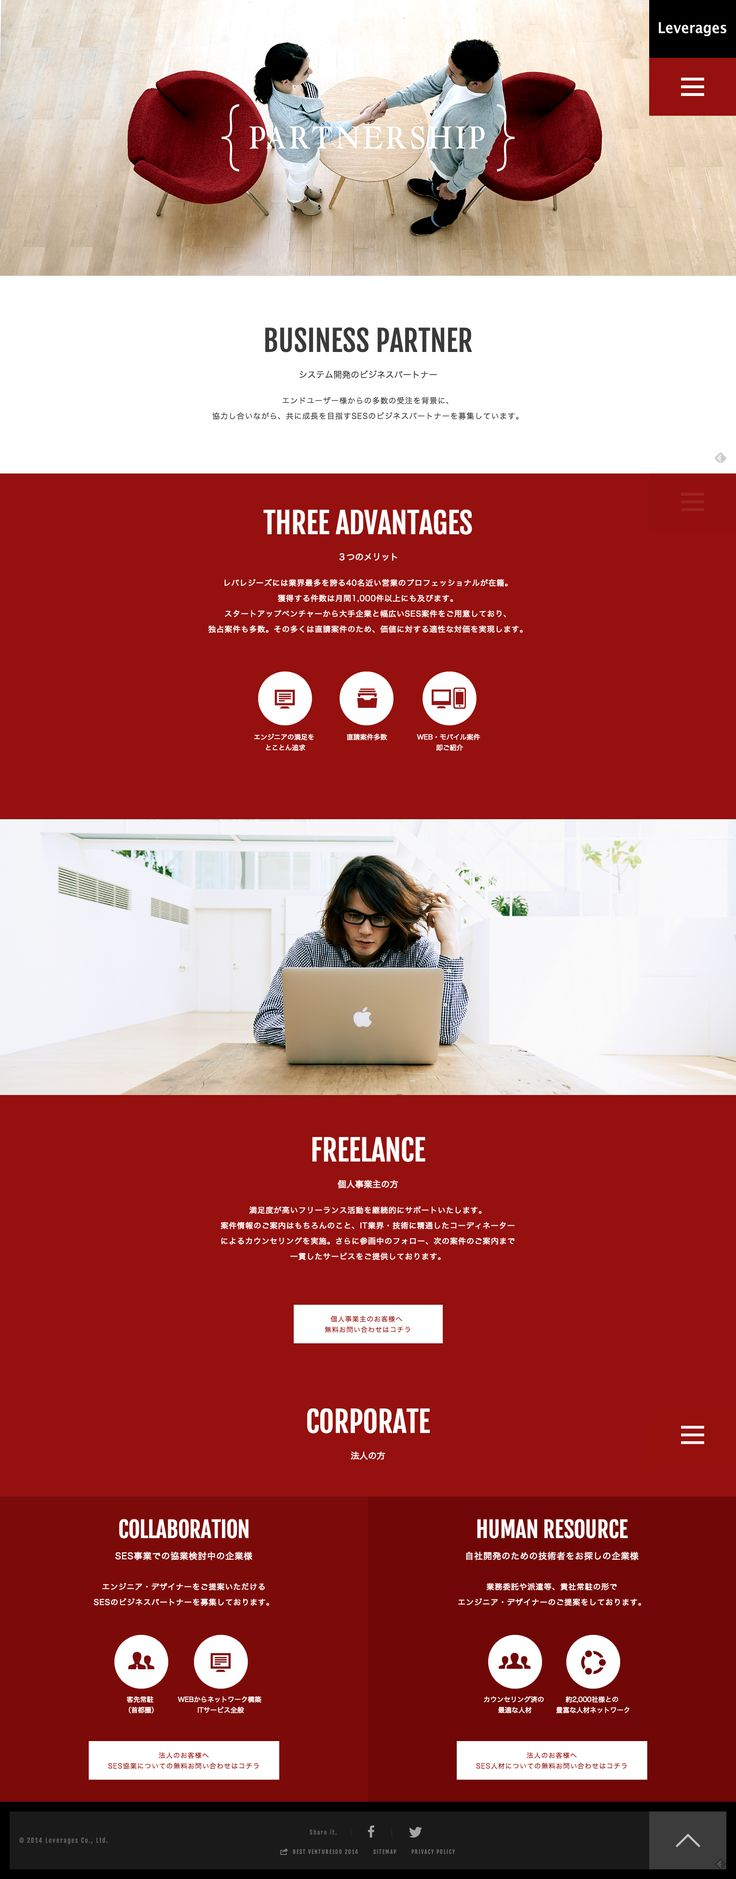 leverages.jp/partnership/